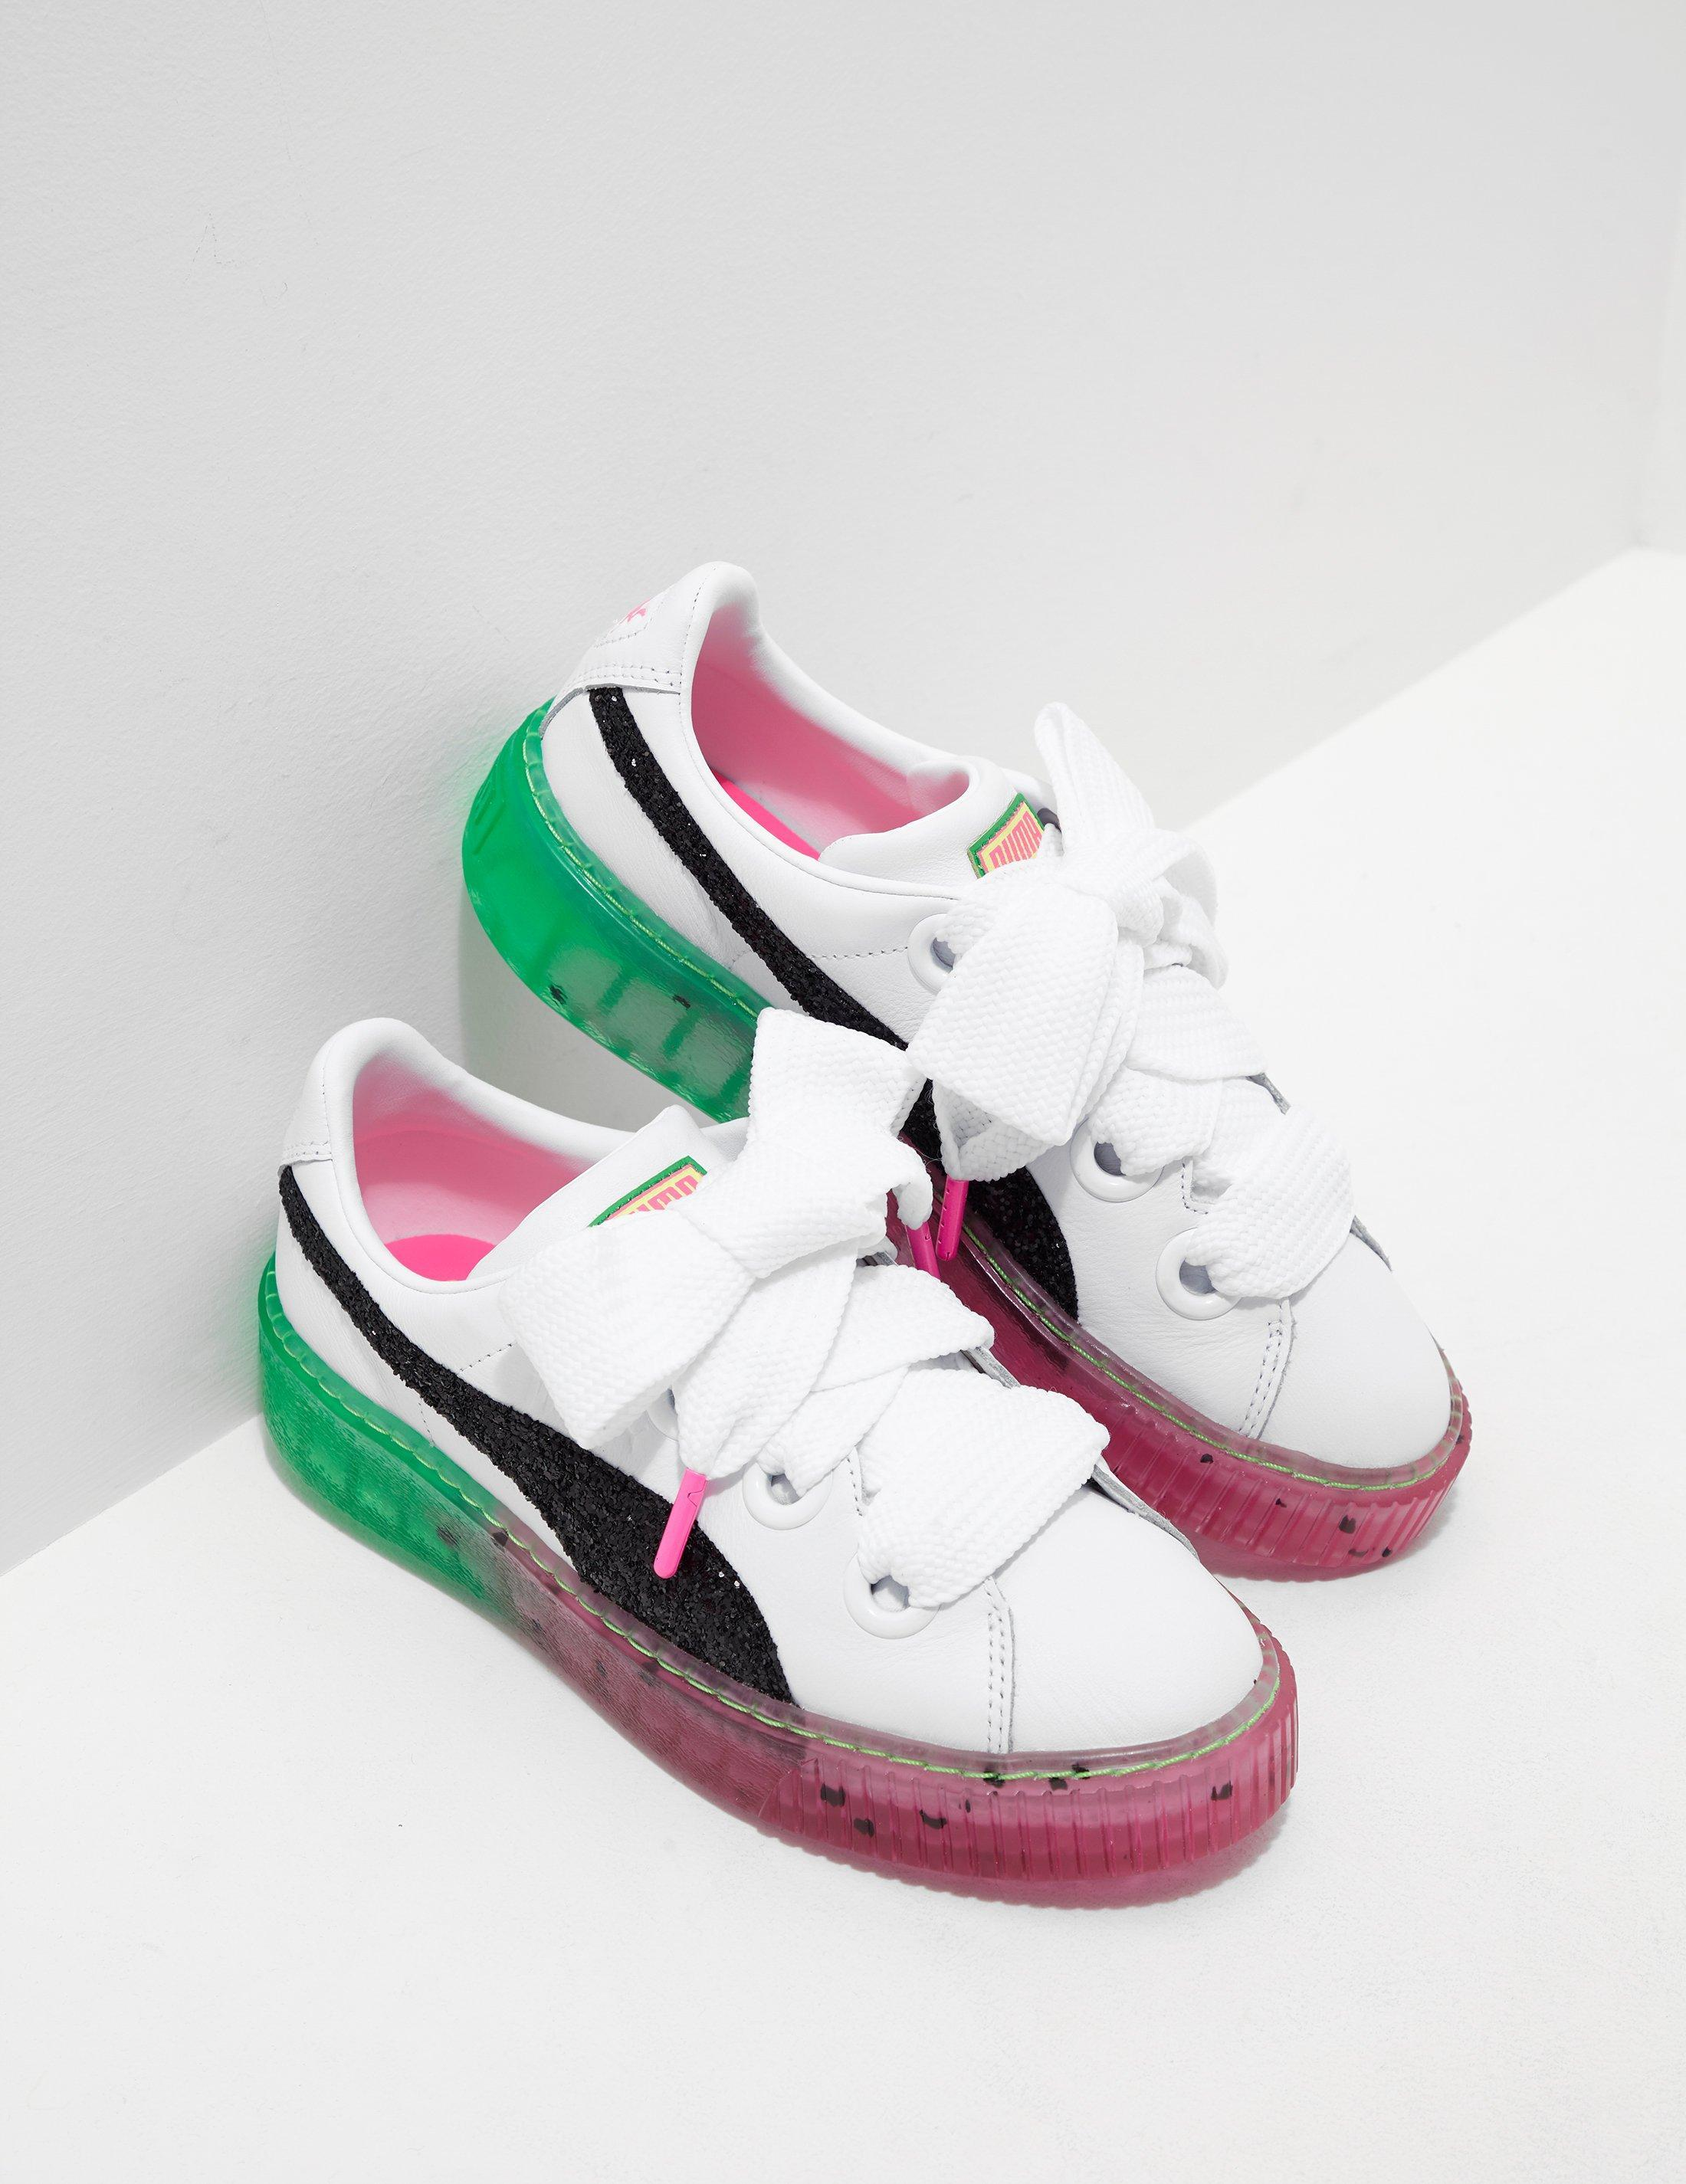 0f5c4d6c7561a6 Lyst - PUMA X Sophia Webster Platform Candy Princess Trainers White ...